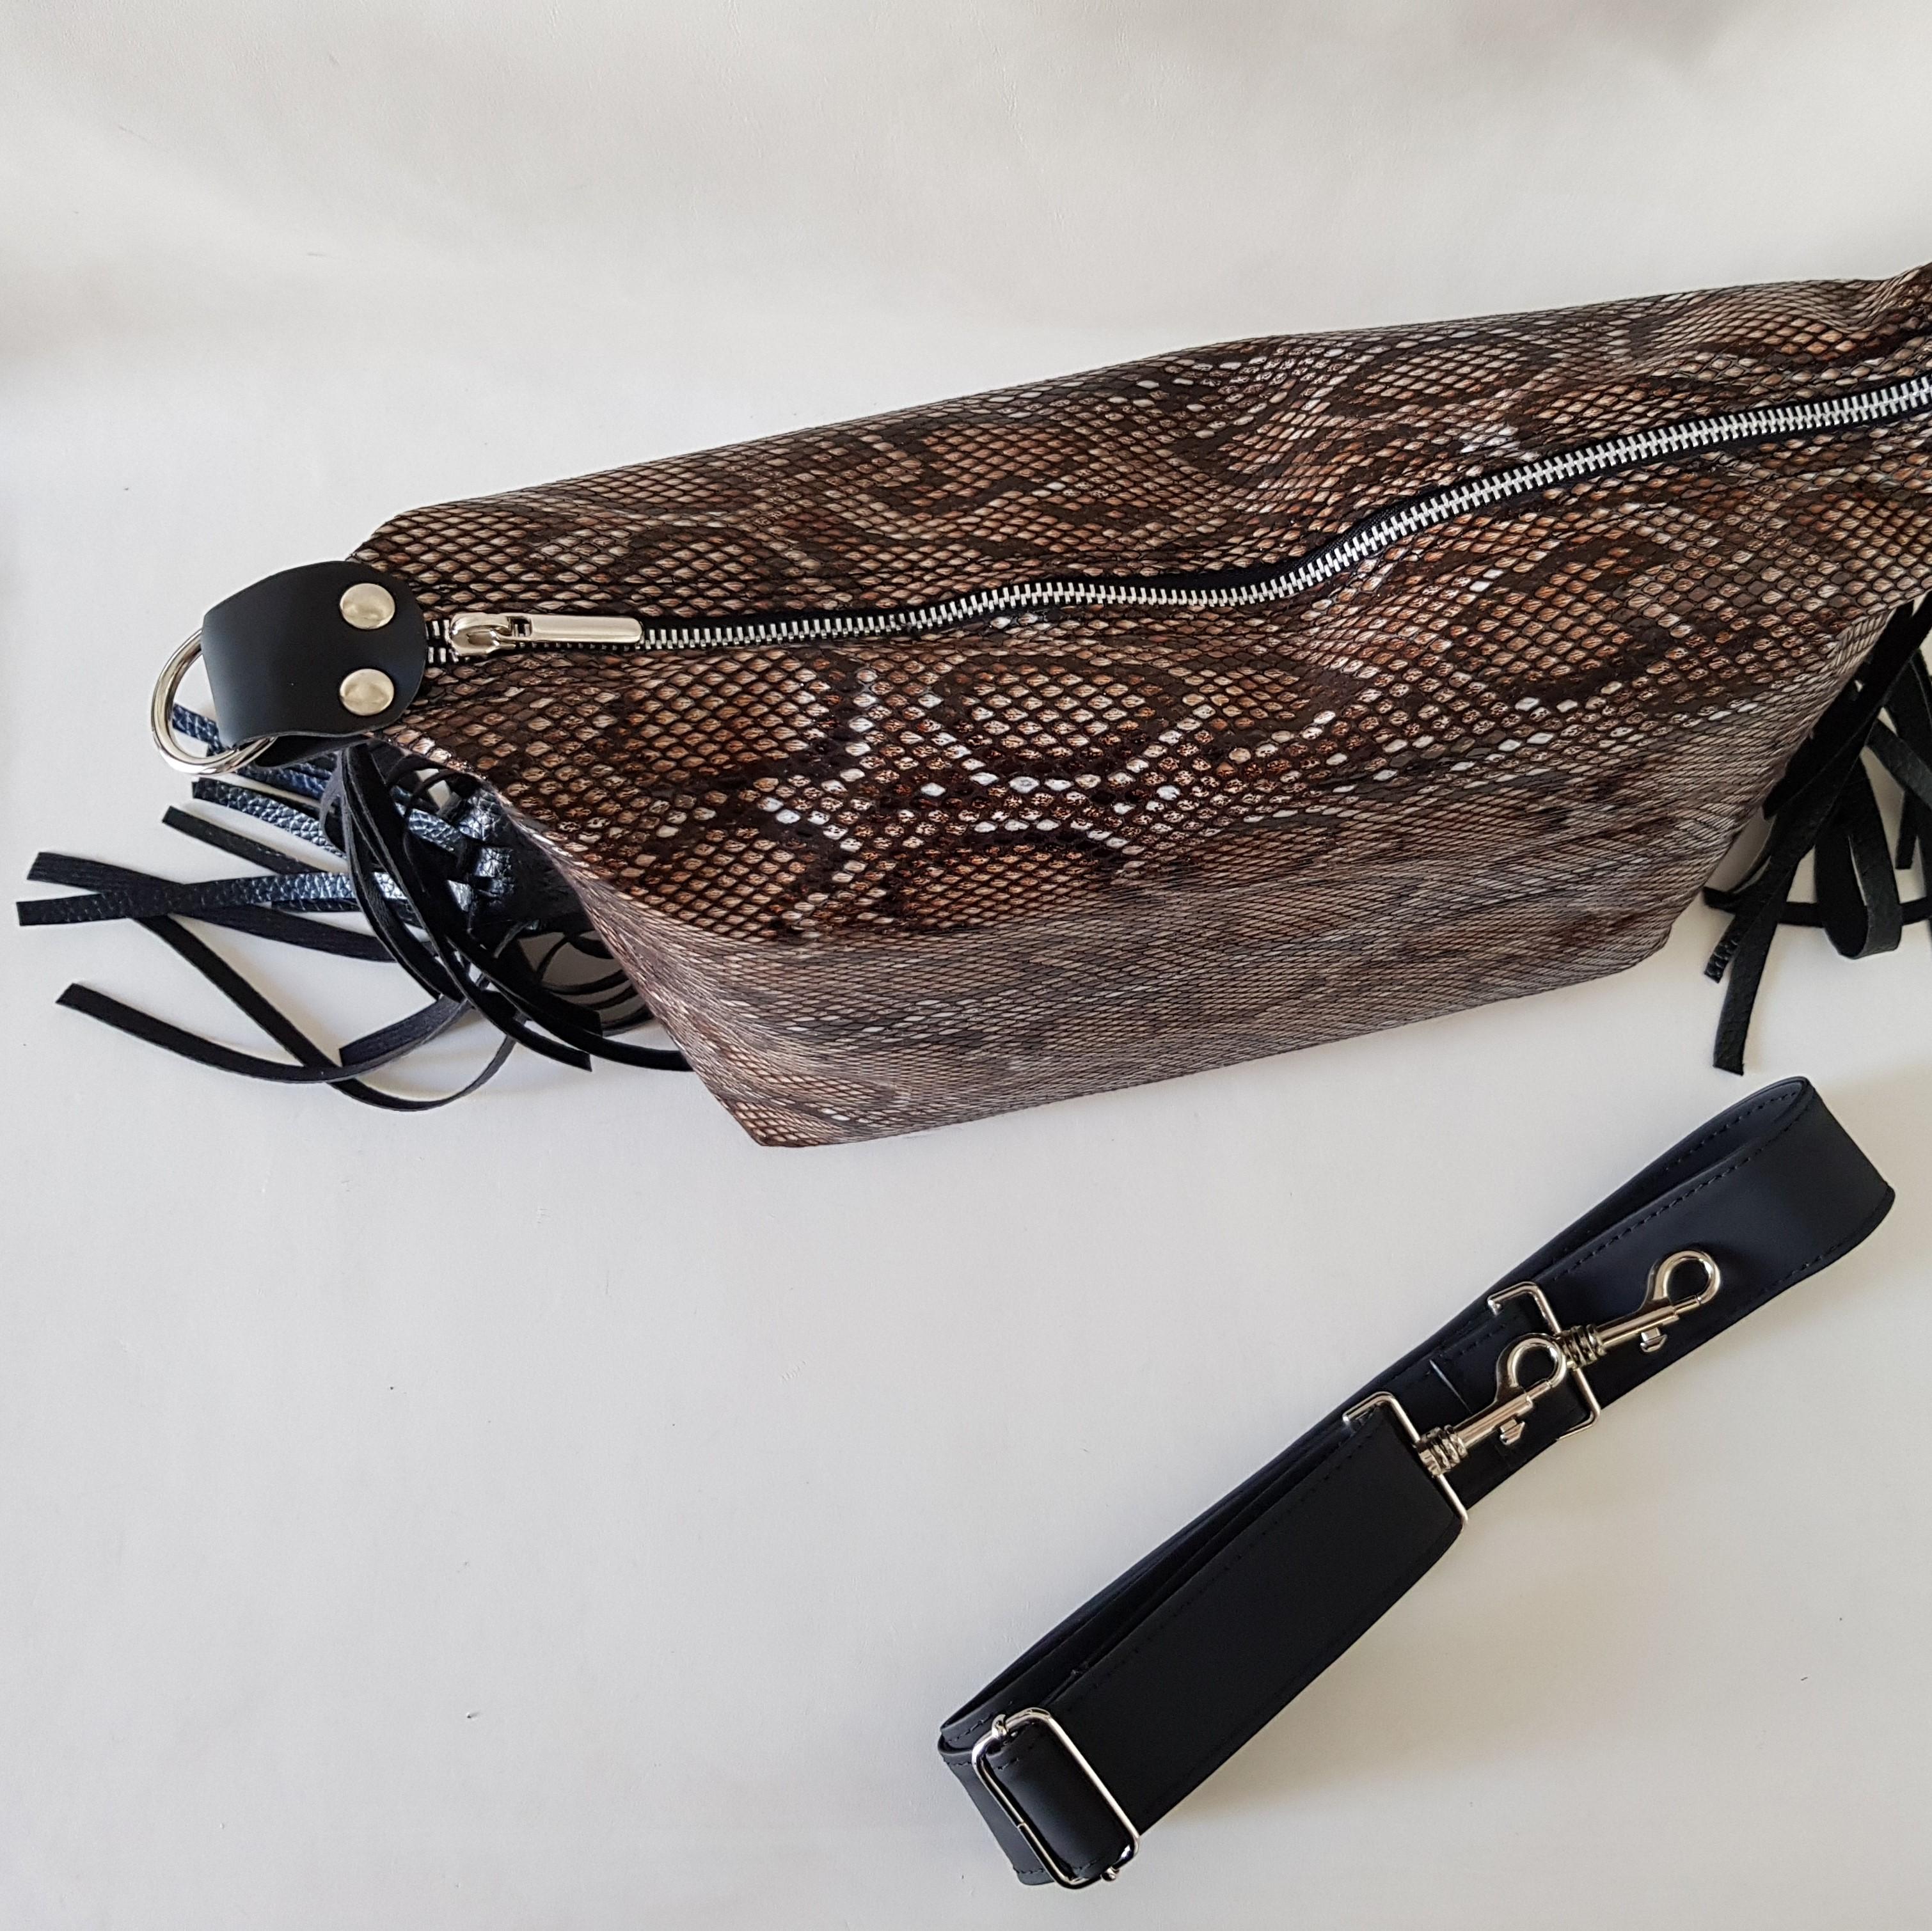 Borsa anaconda frange - Lia diva calzature ...